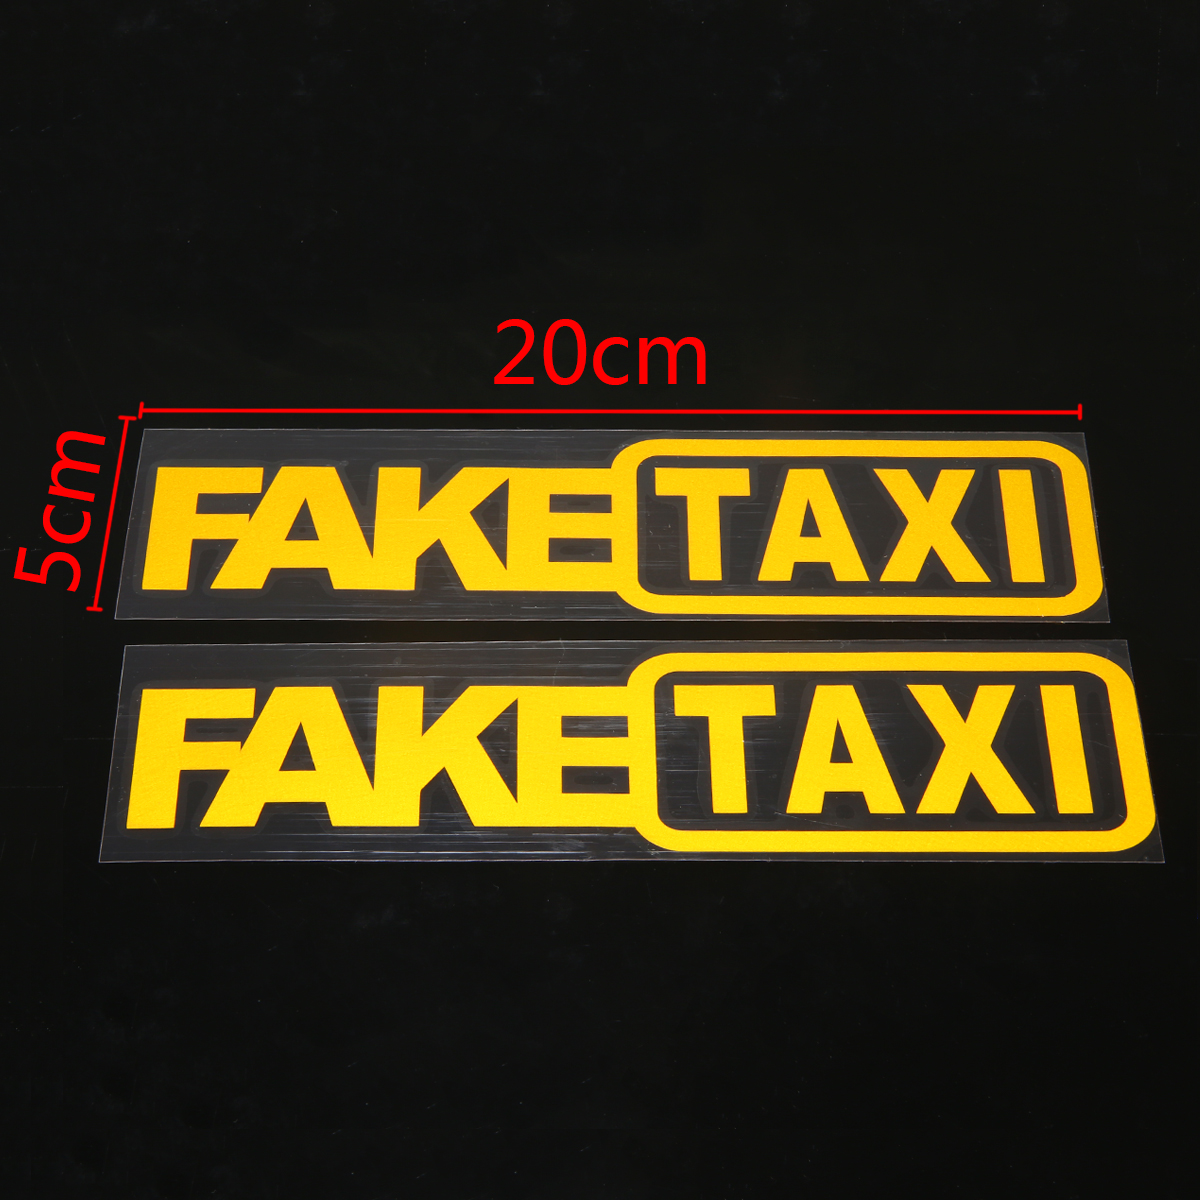 2pcs FAKE TAXI Sticker Car Styling Car Bike Motorcycle Helmet Decal Emblem Self Adhesive Vinyl Stickers